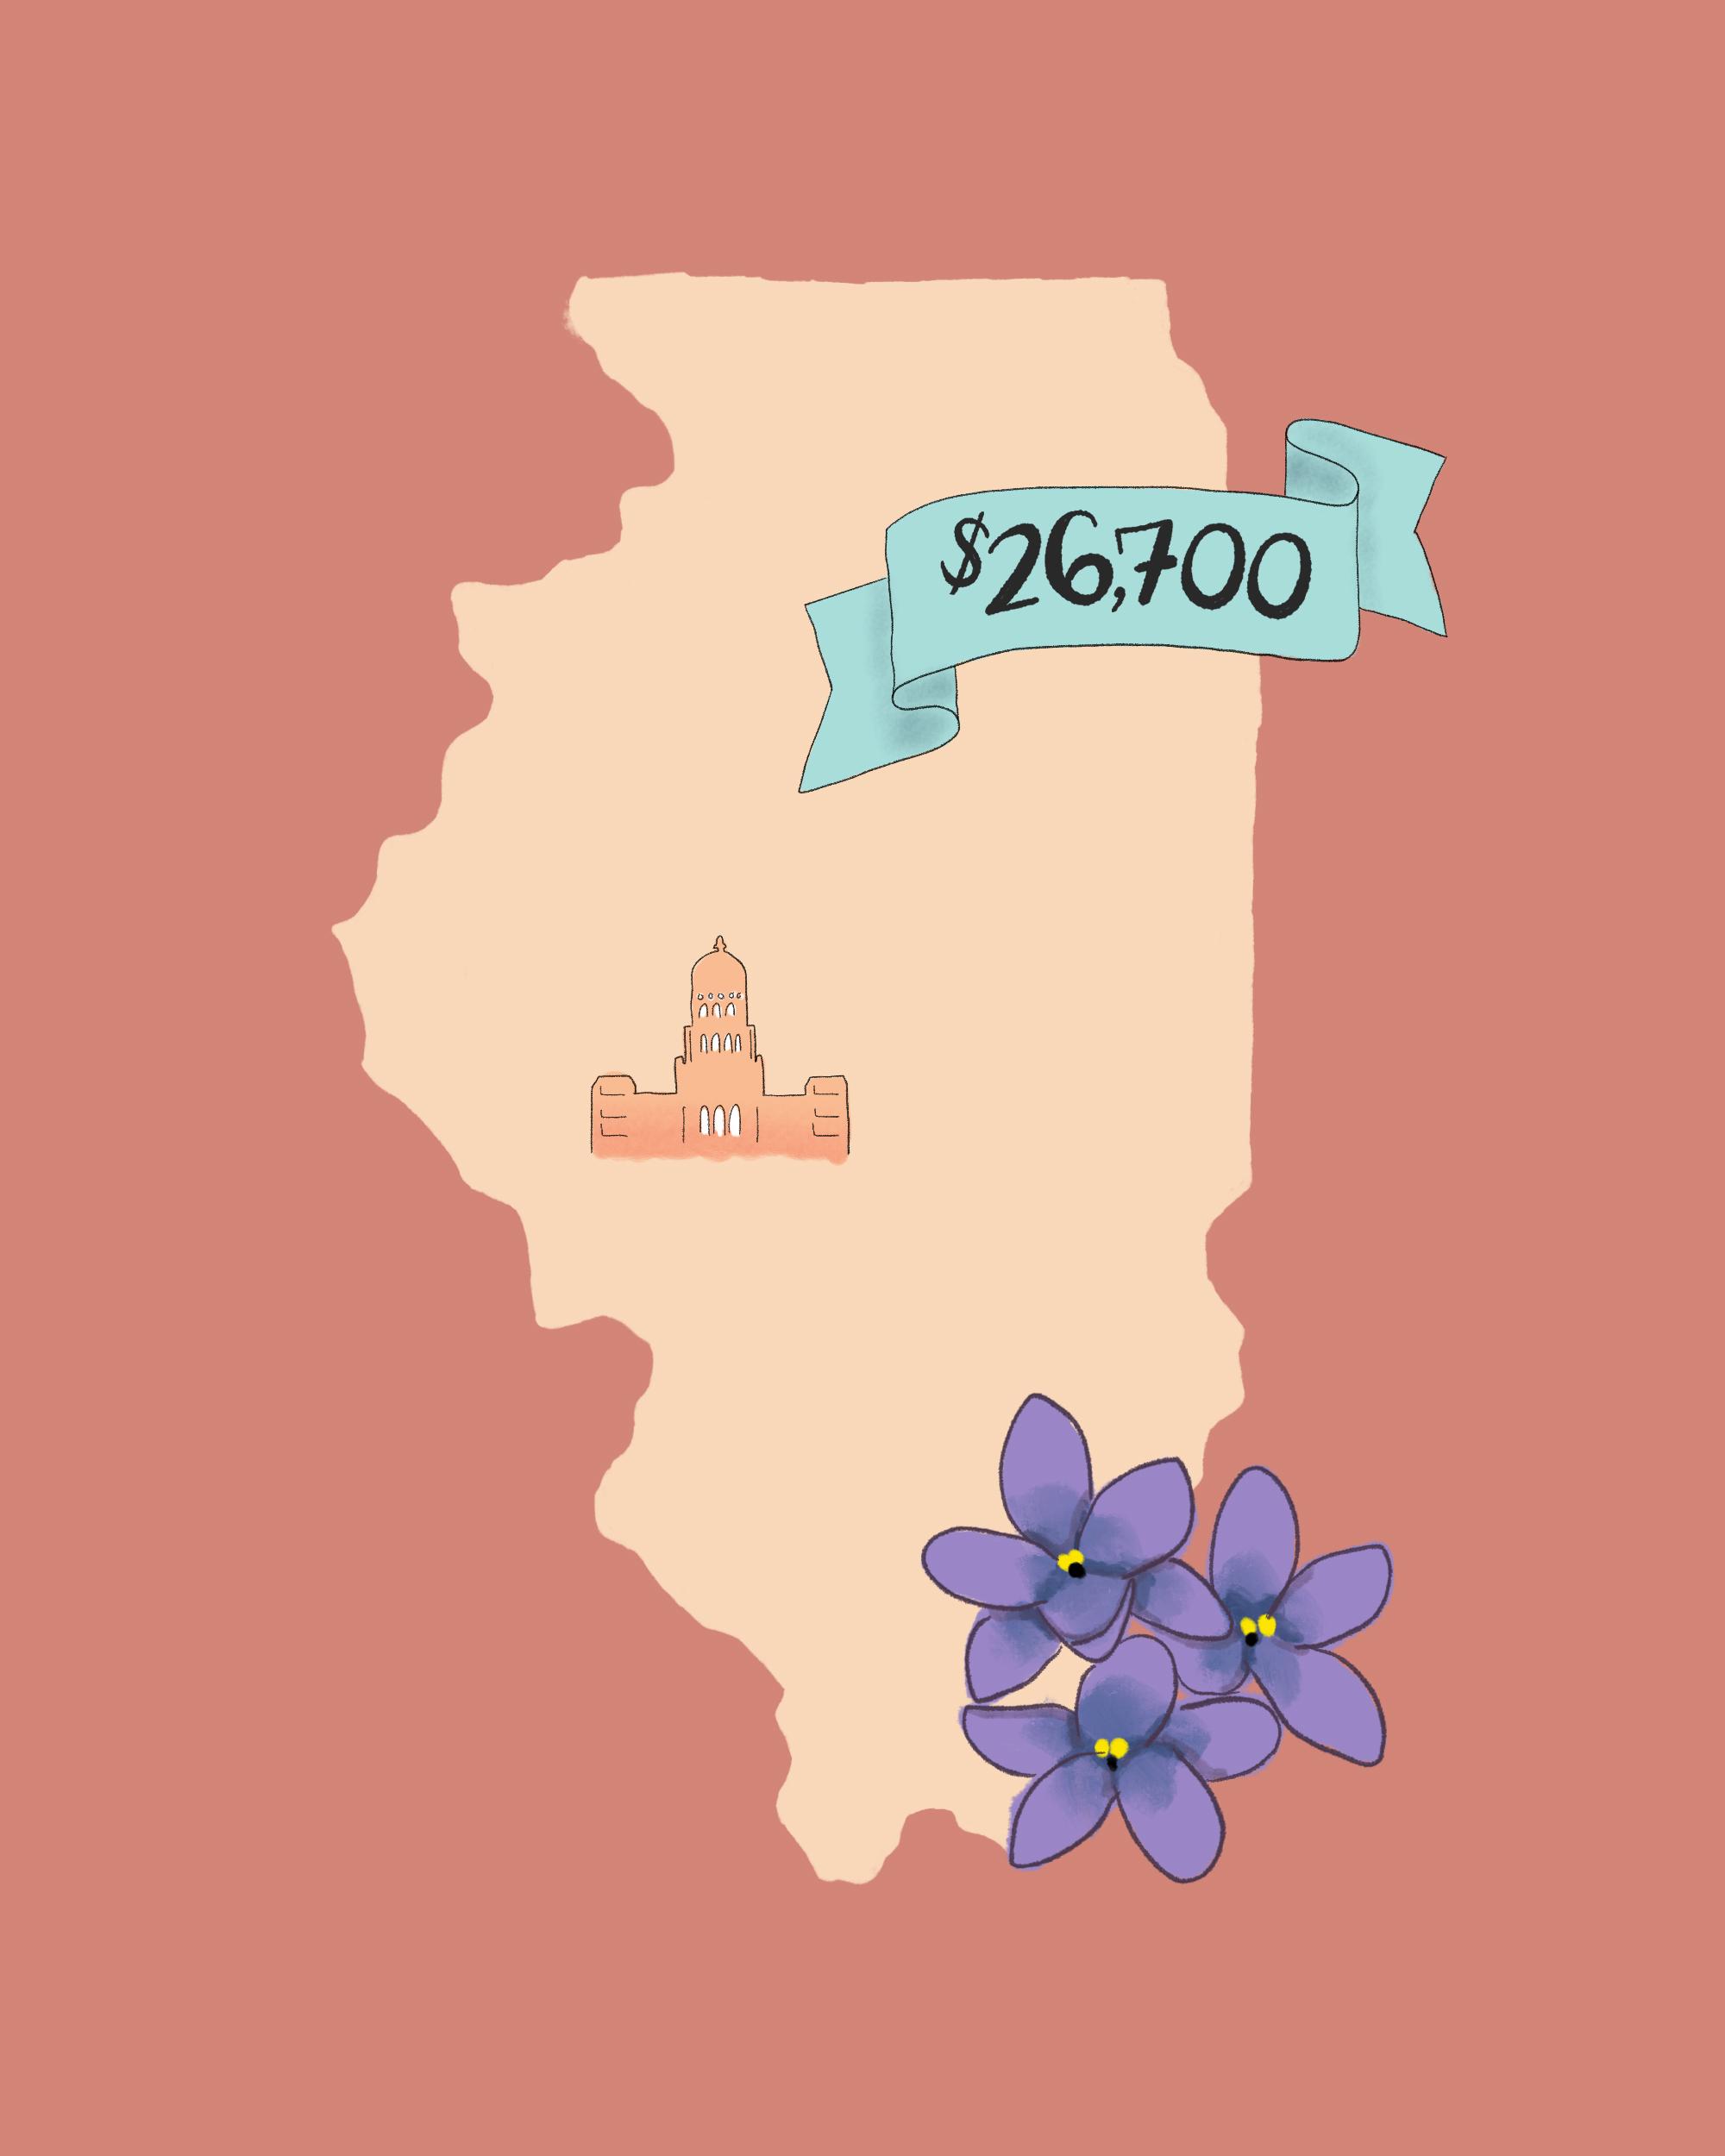 state wedding costs illustration illinois